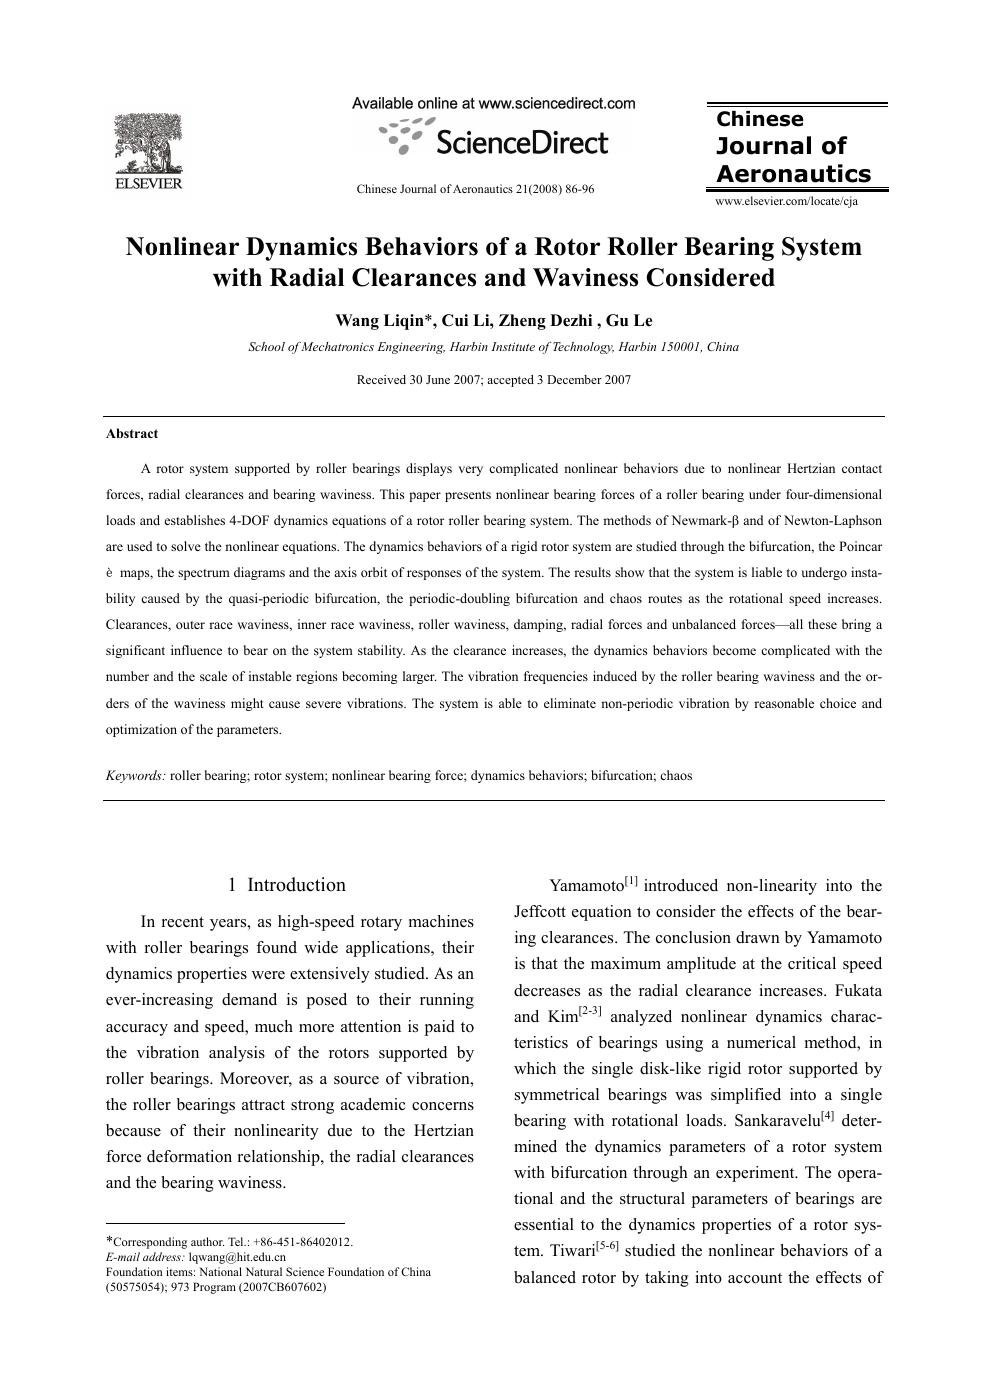 Nonlinear Dynamics Behaviors of a Rotor Roller Bearing